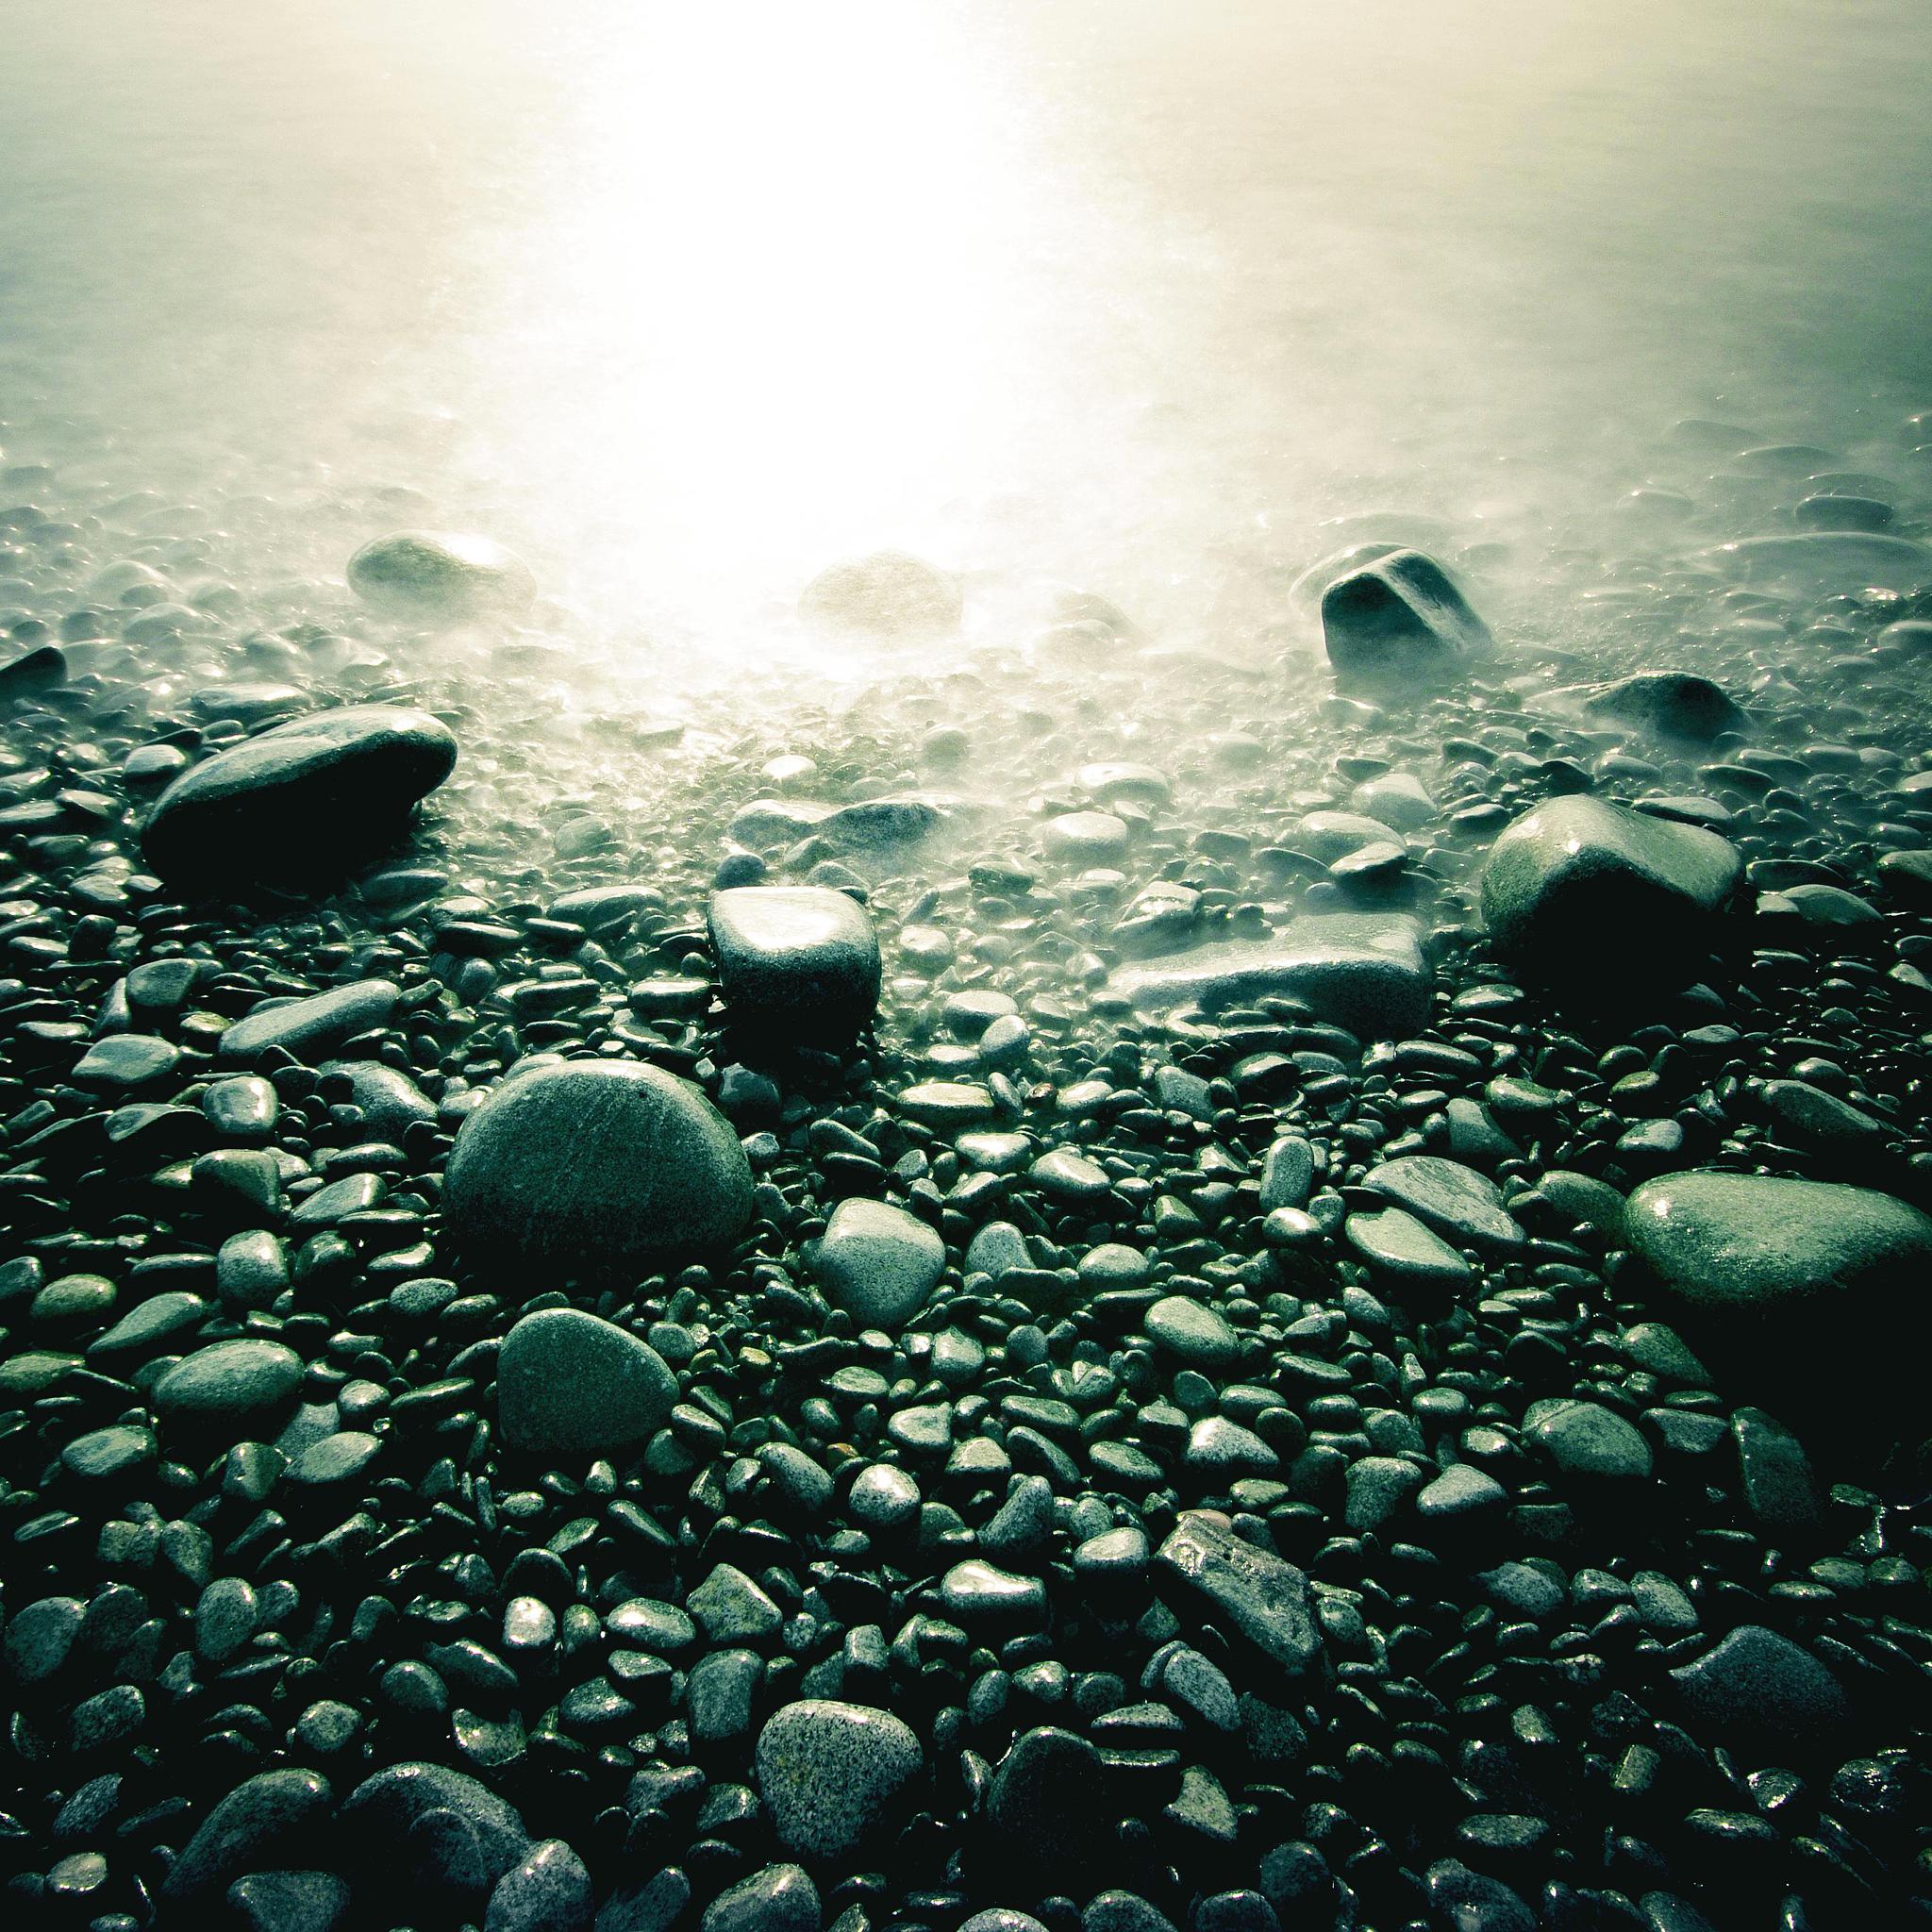 Stones-in-Beach-3Wallpapers-iPad-Retina